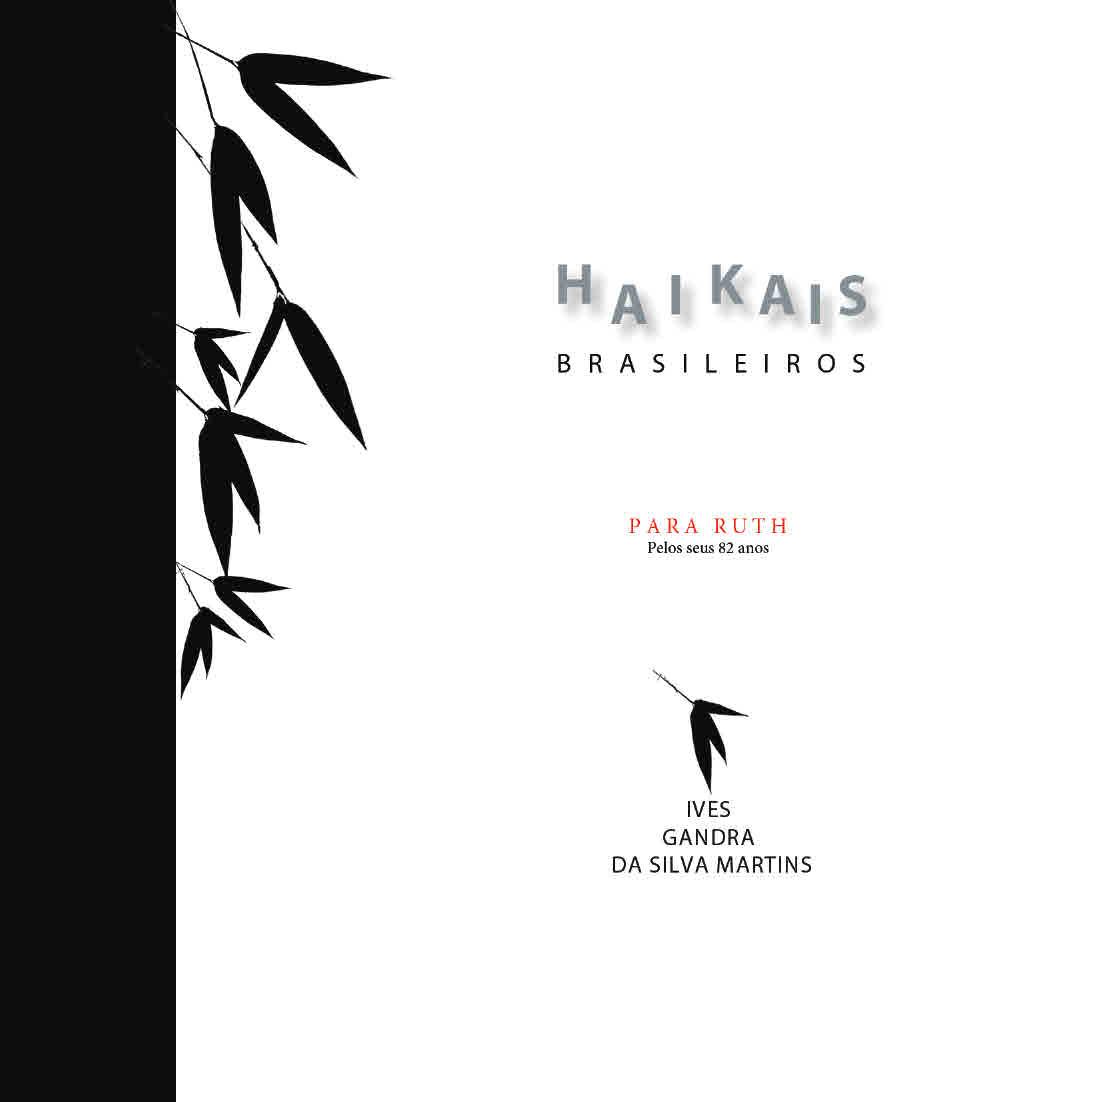 Haikais brasileiros